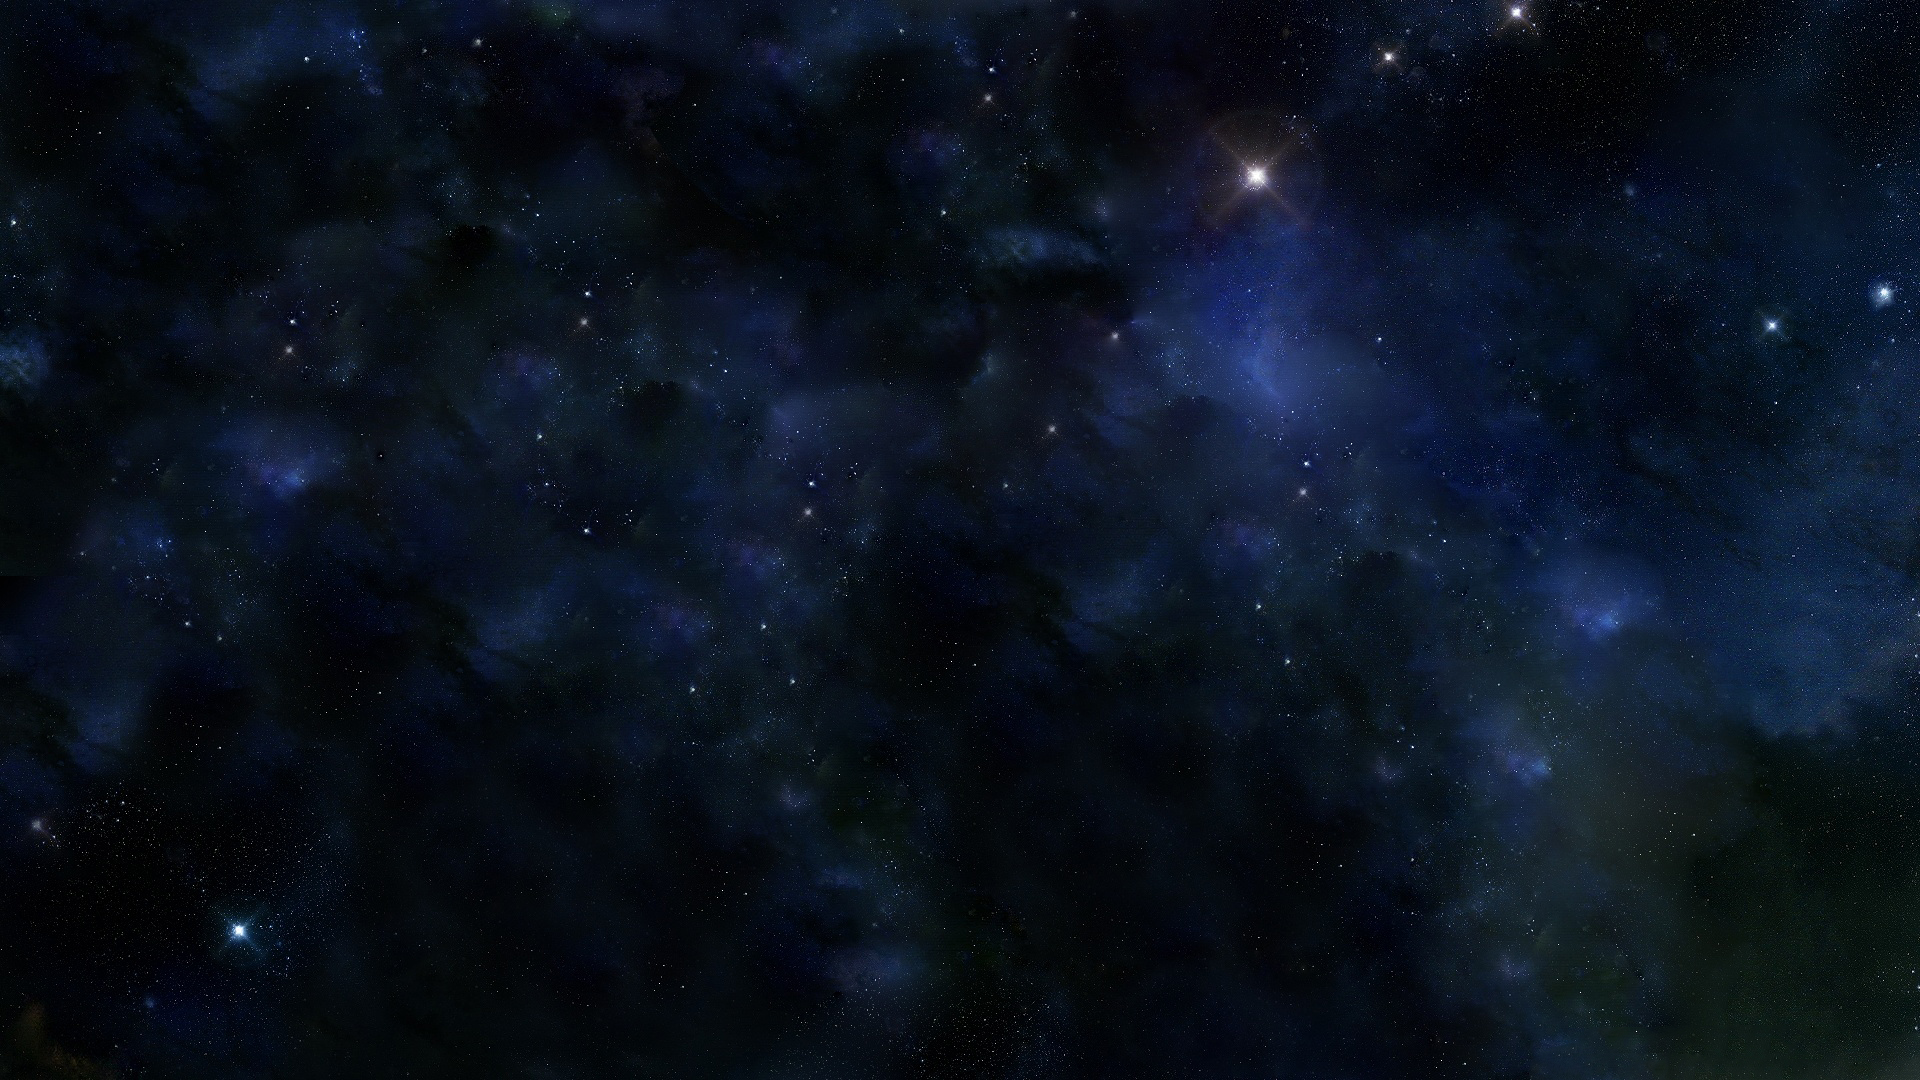 Dark Galaxy Wallpaper 17017 Wallpaper High Resolution